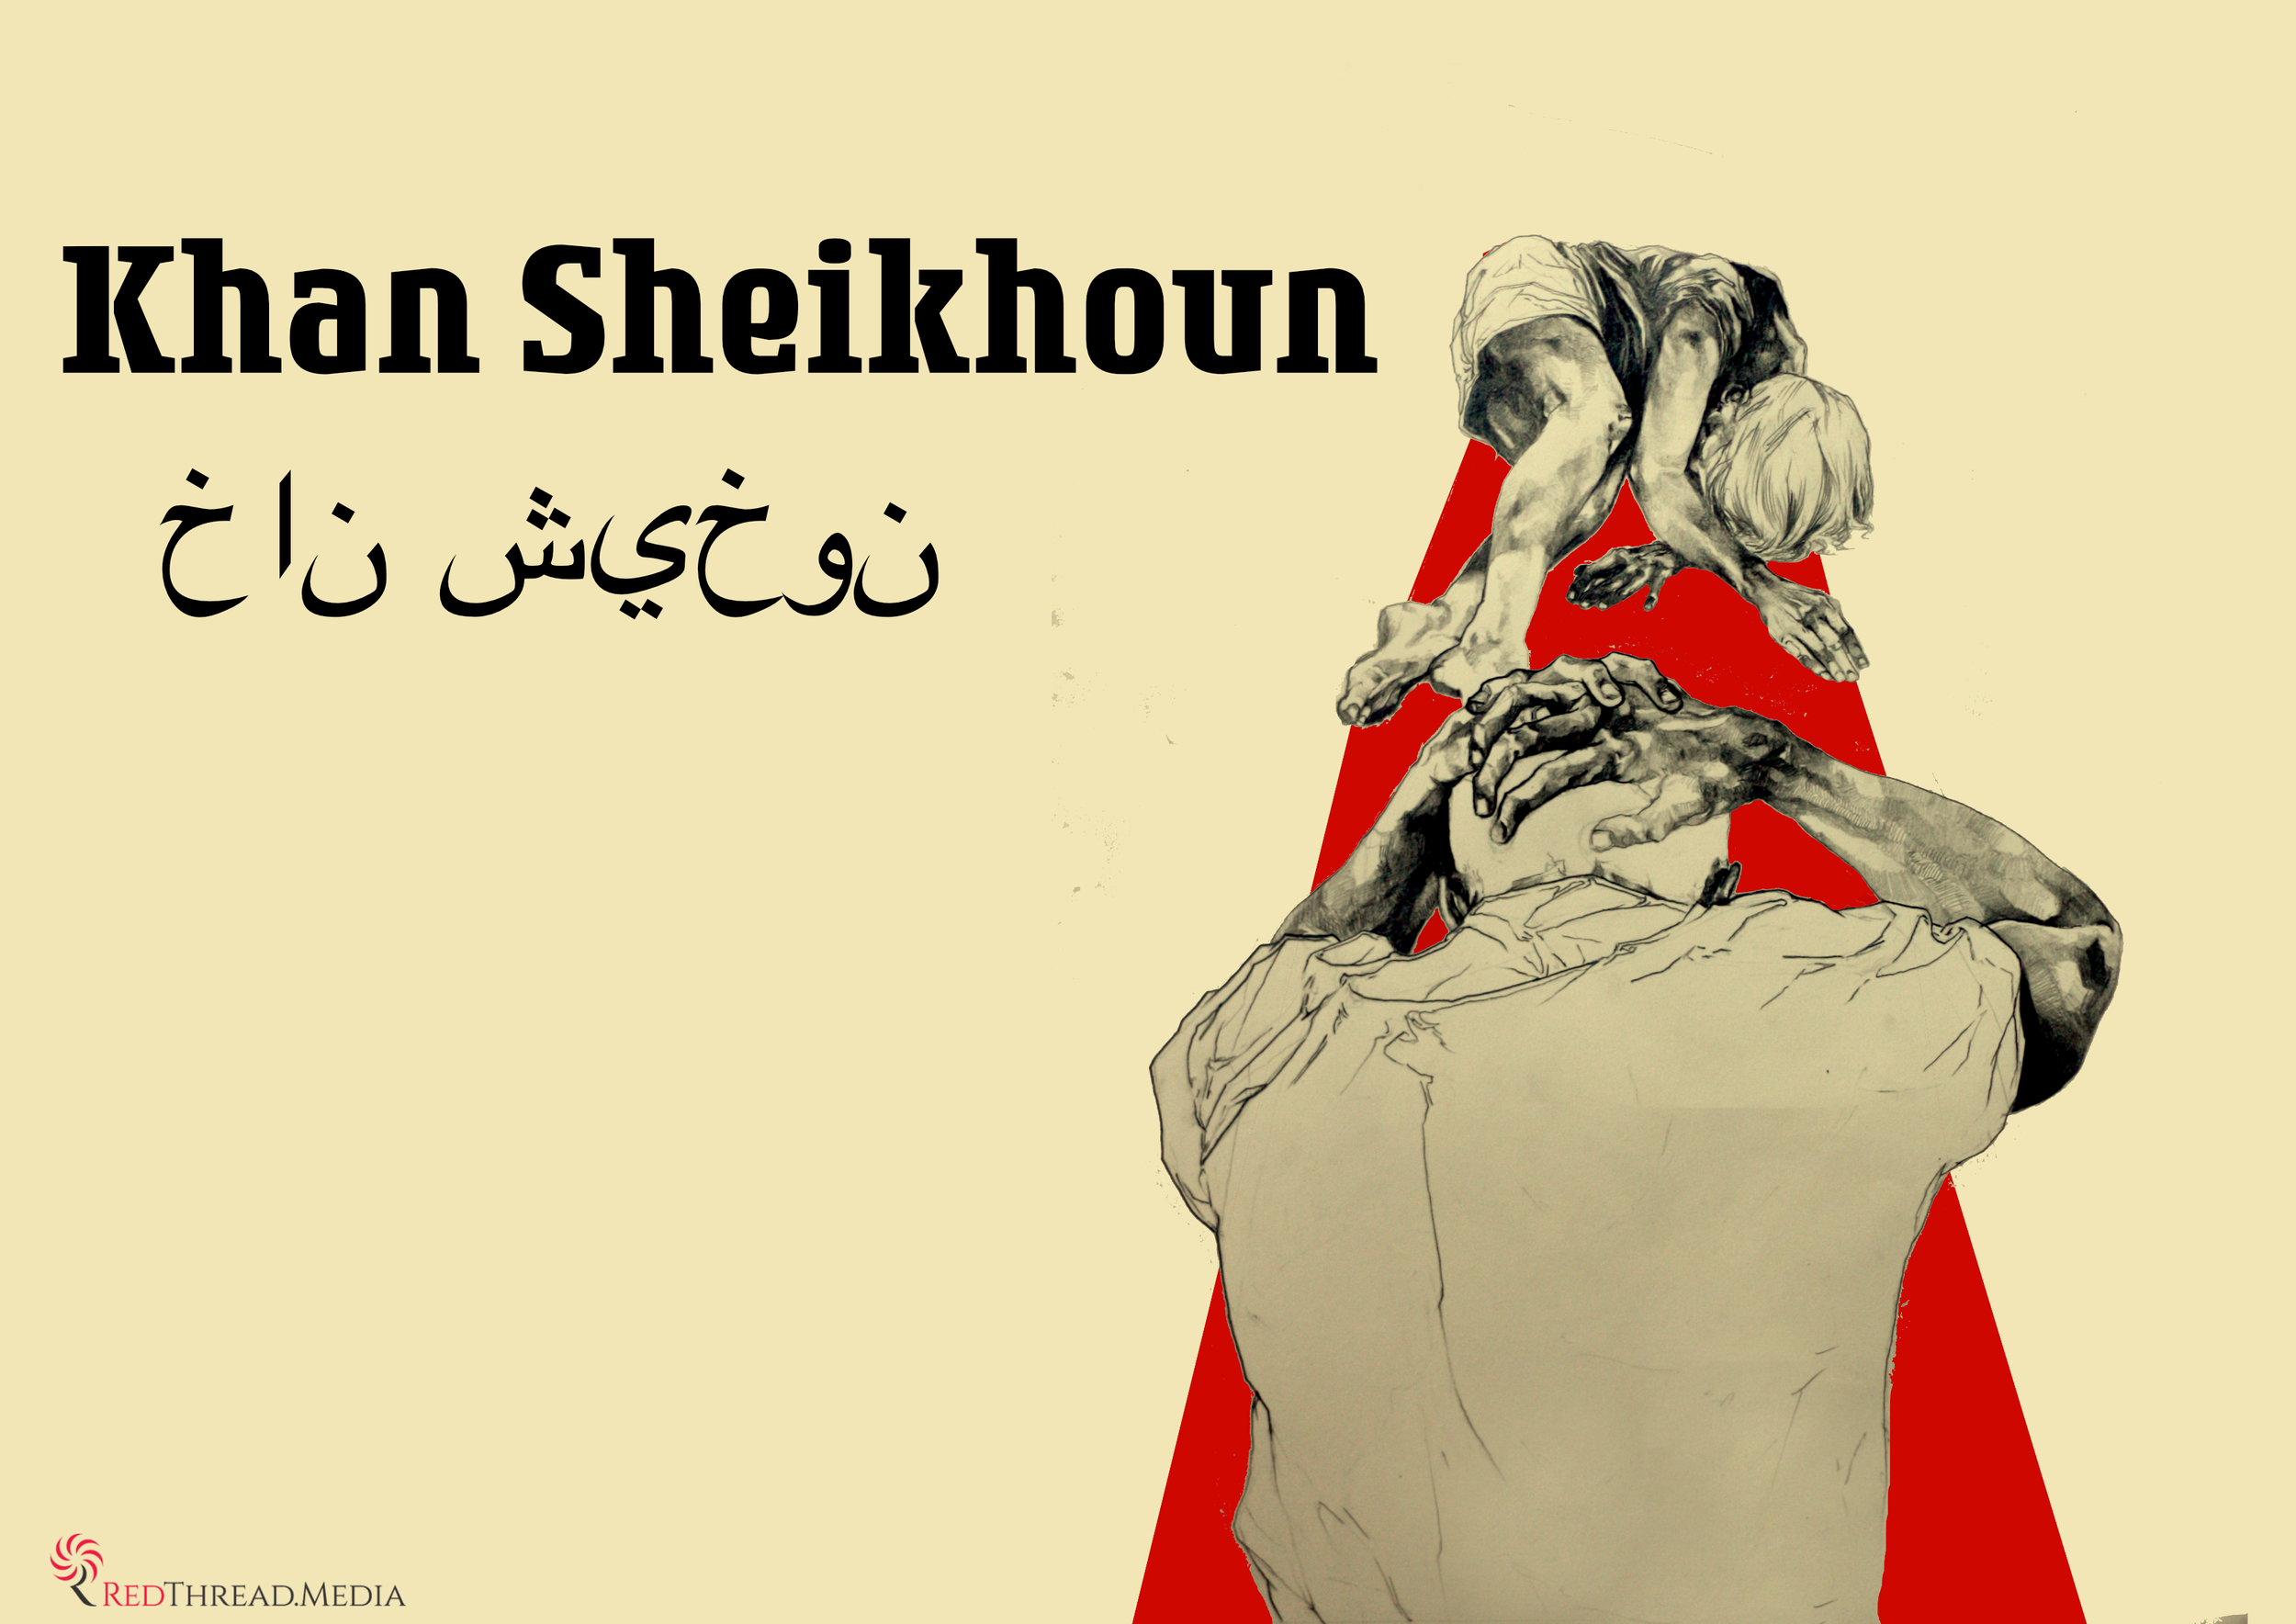 Khan Sheikhoun - In Development